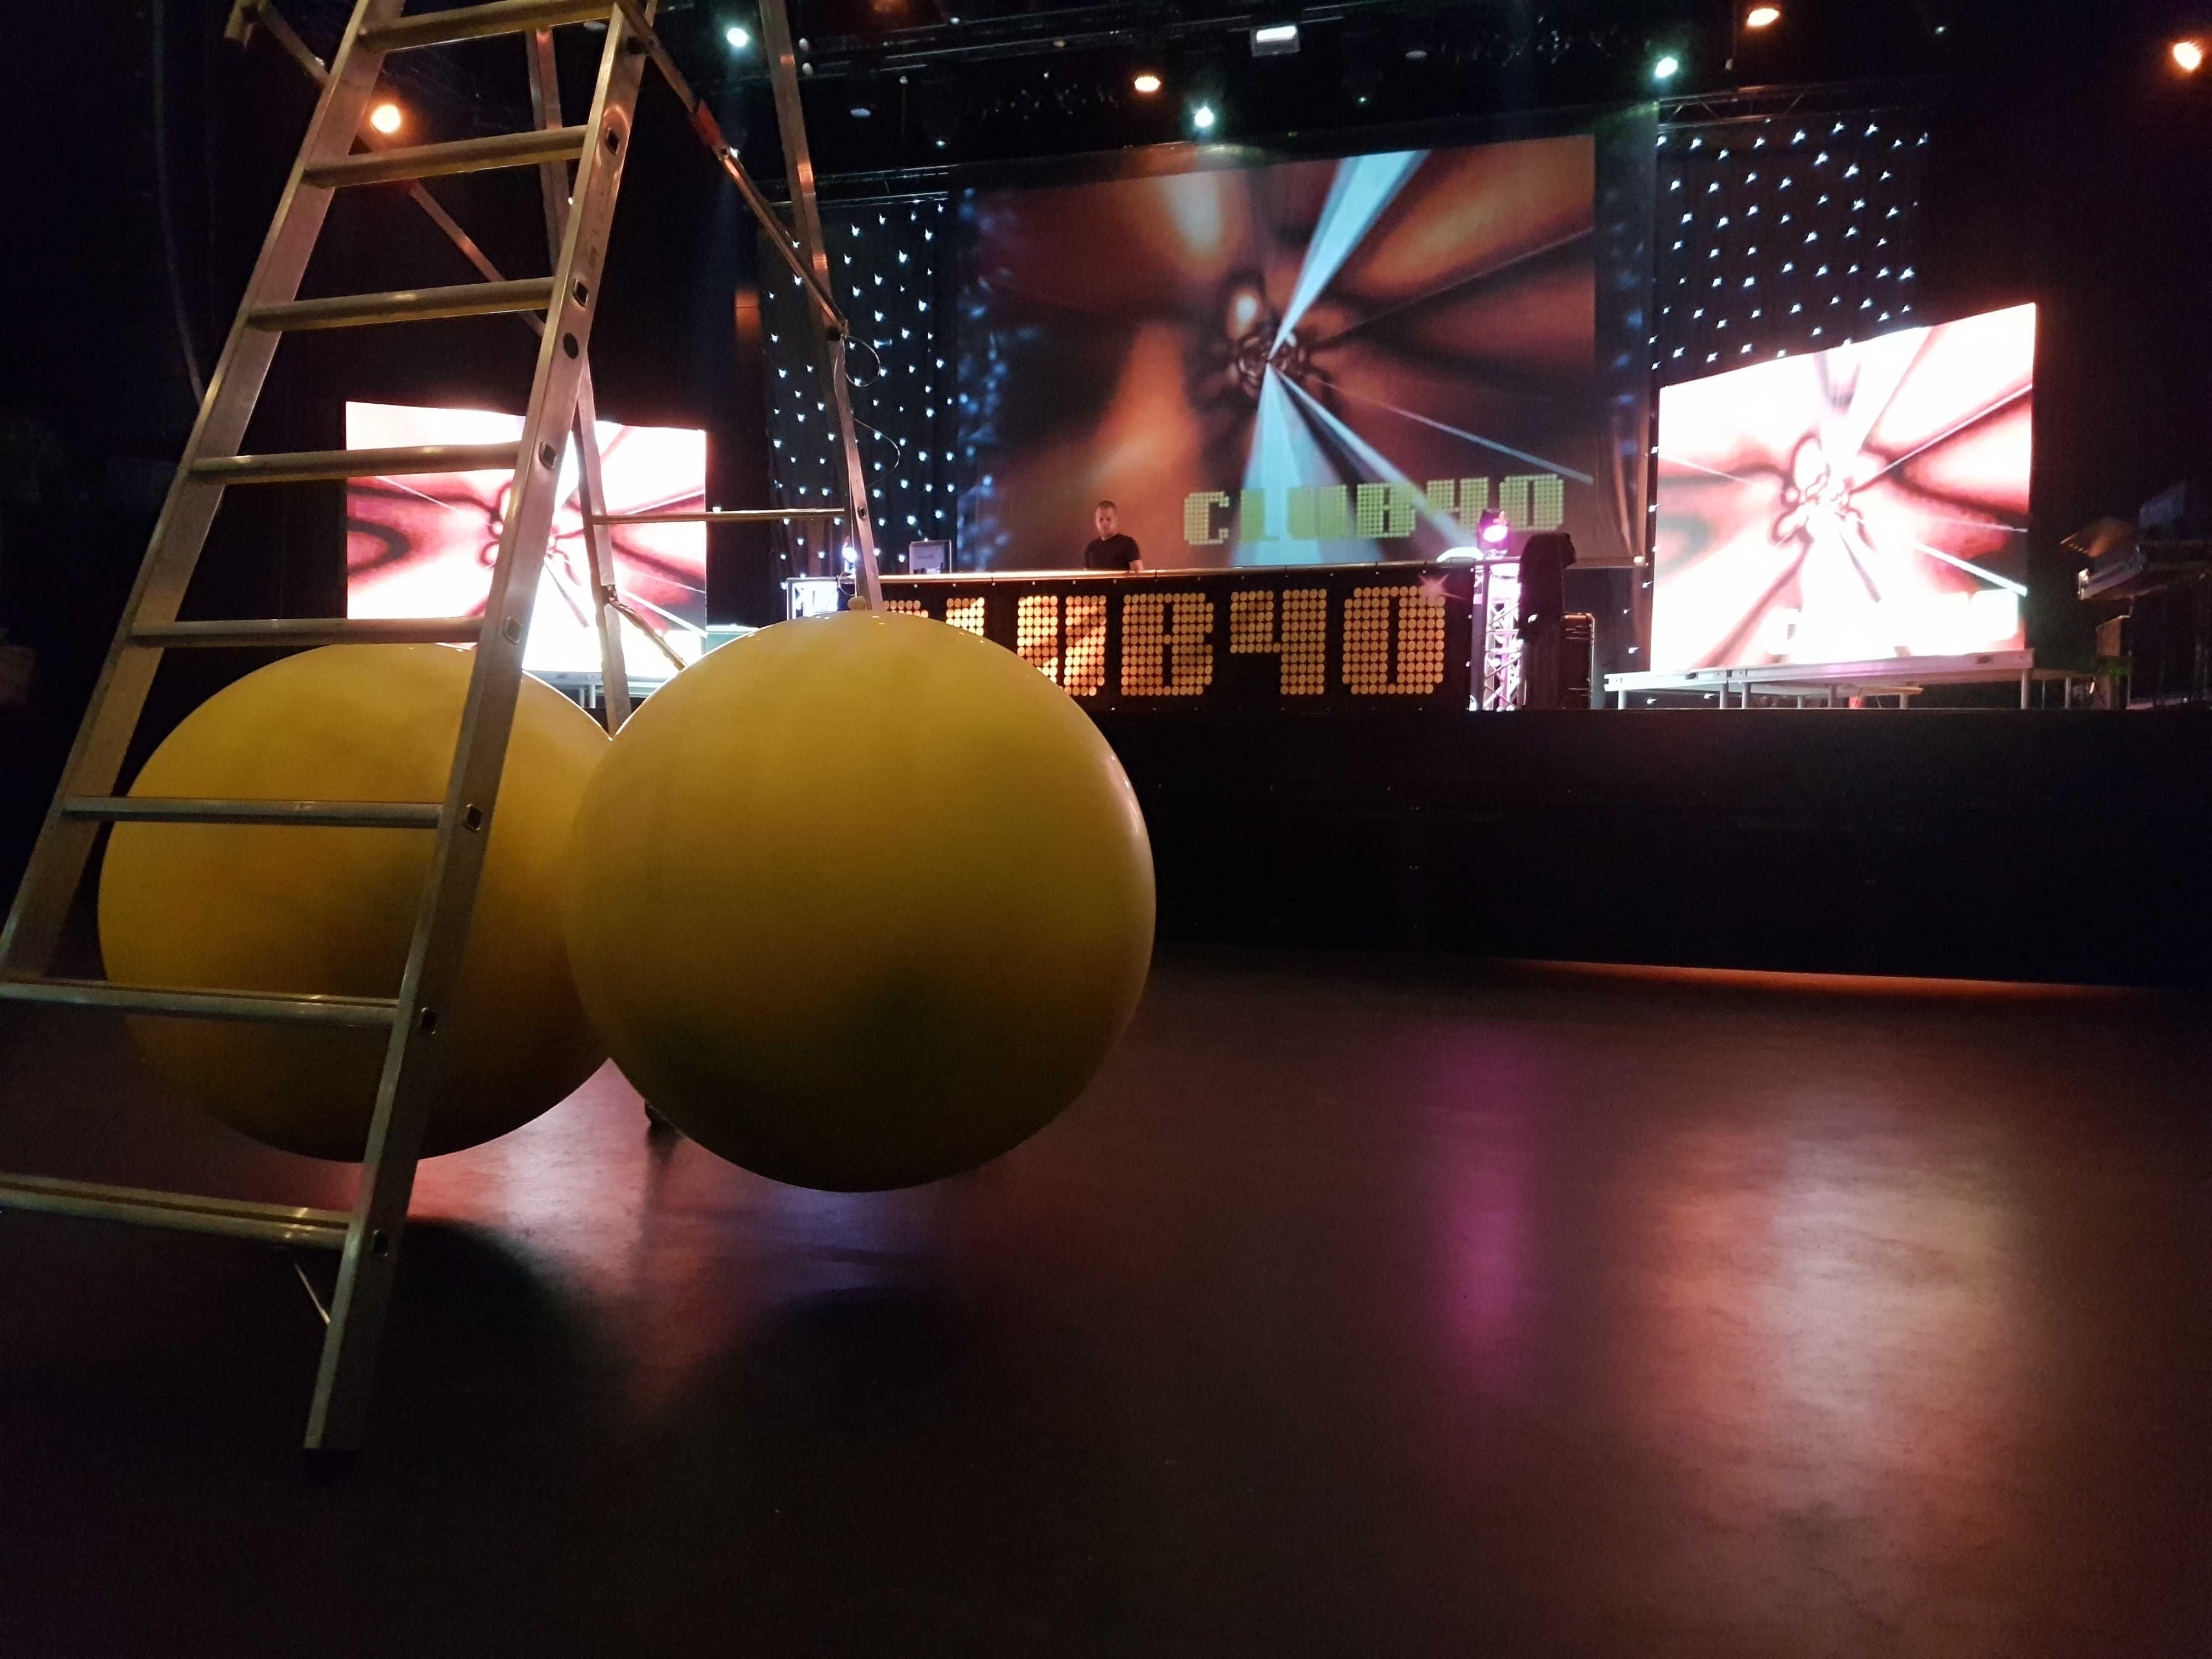 Club-40-Victoria-podium-Alkmaar